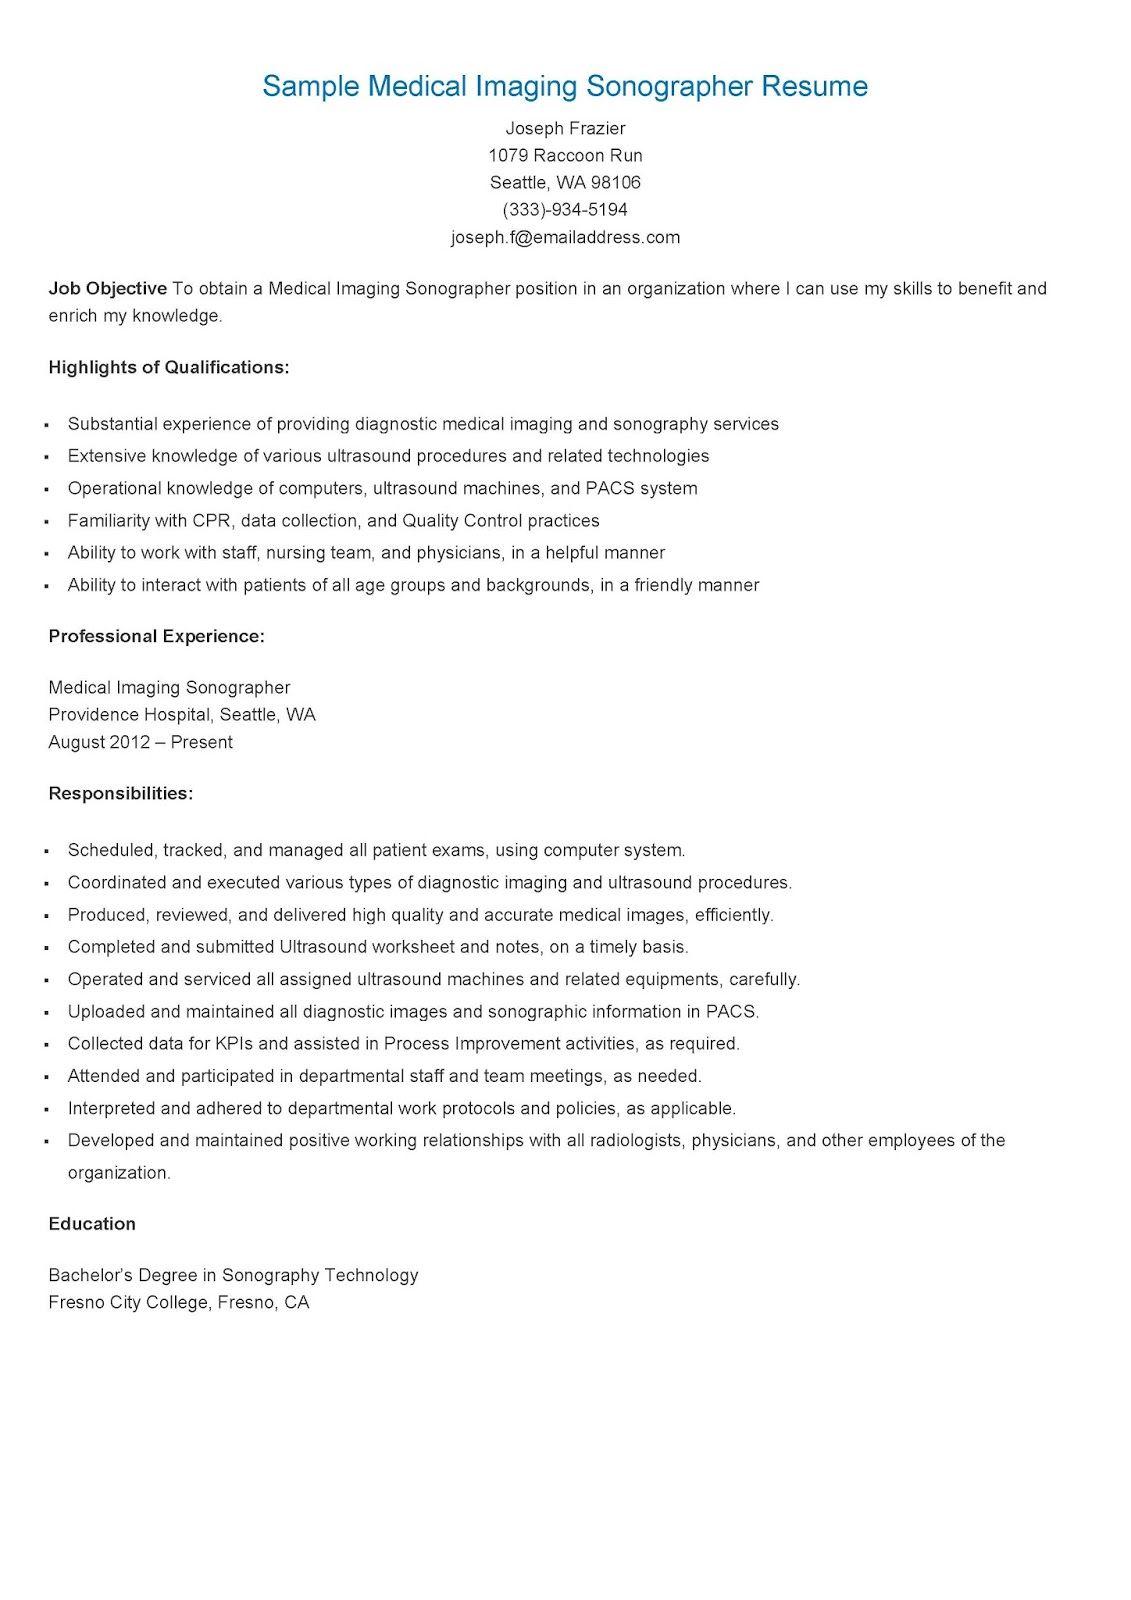 Sample Medical Imaging Sonographer ResumeResume Samples